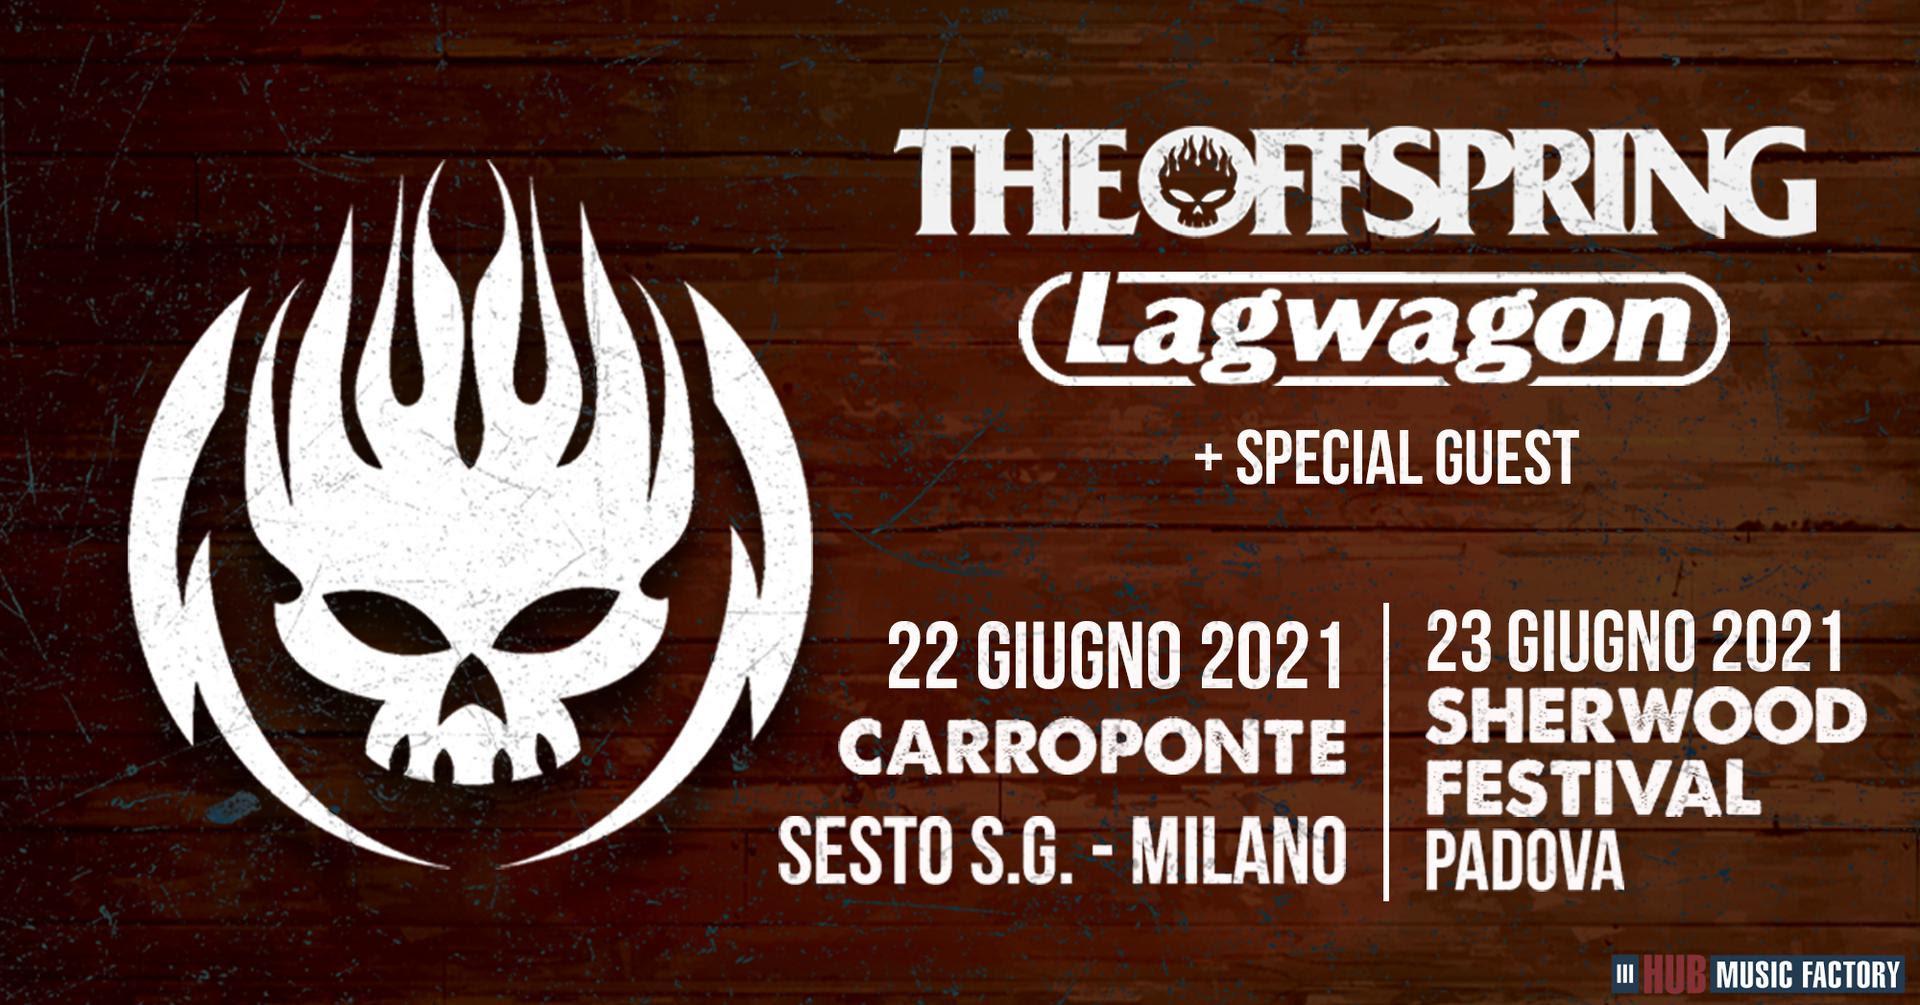 THE OFFSPRING, LAGWAGON: le date italiane rinviate al 2021